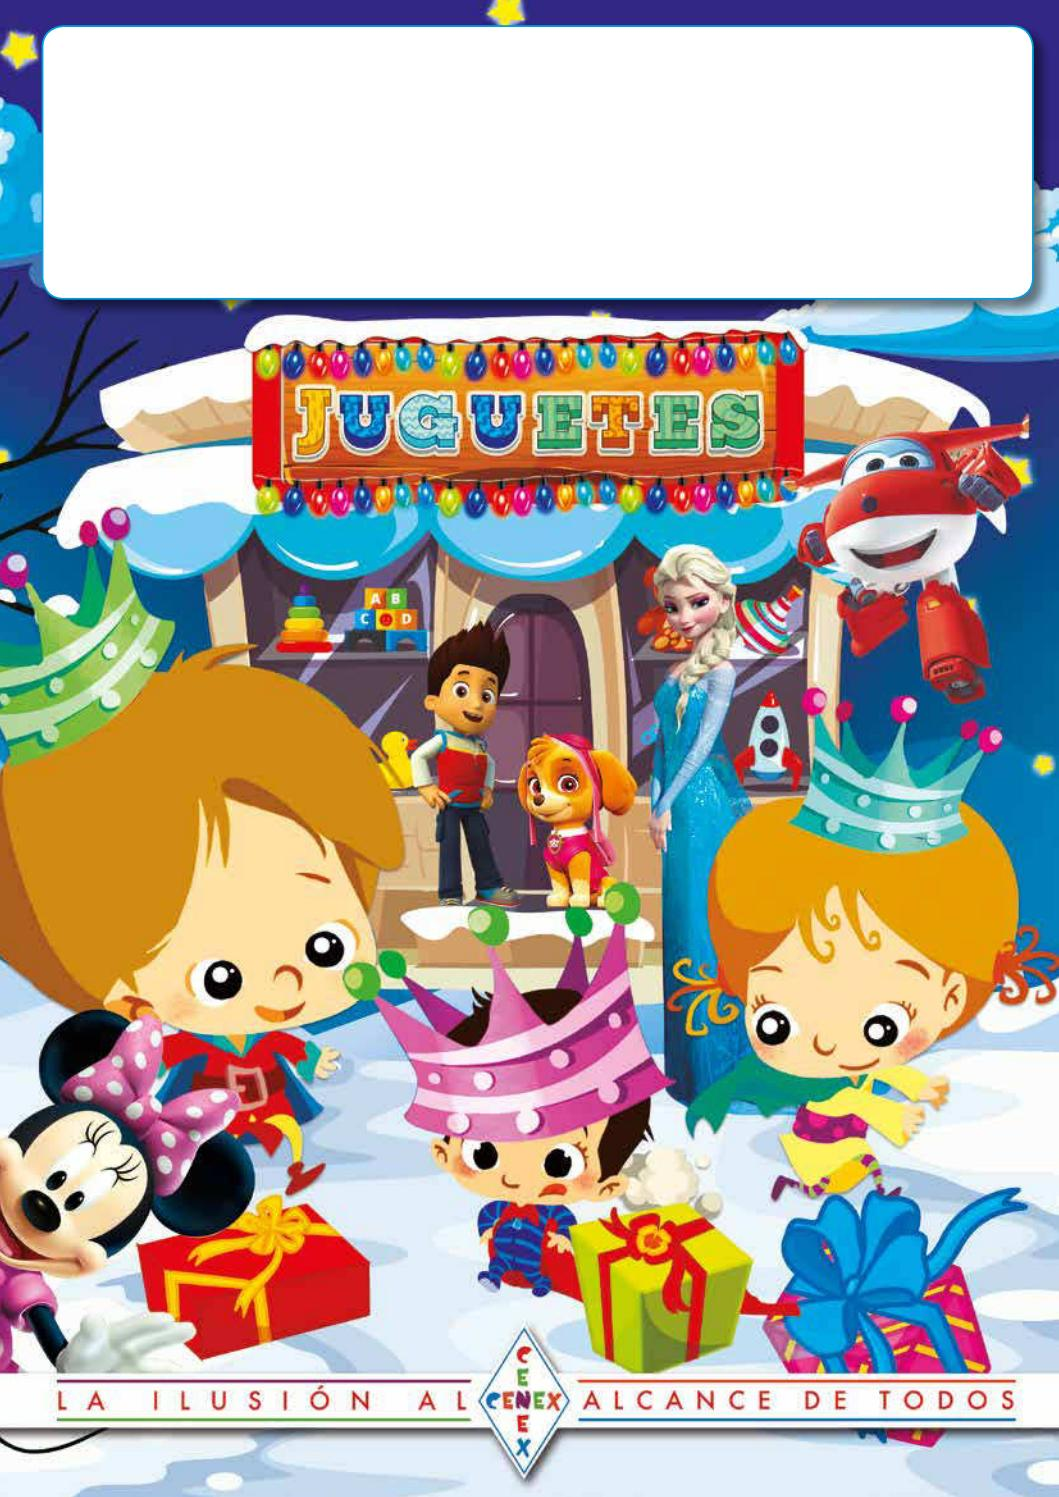 Catalogo navidad 2016 by Yogur Toys - issuu